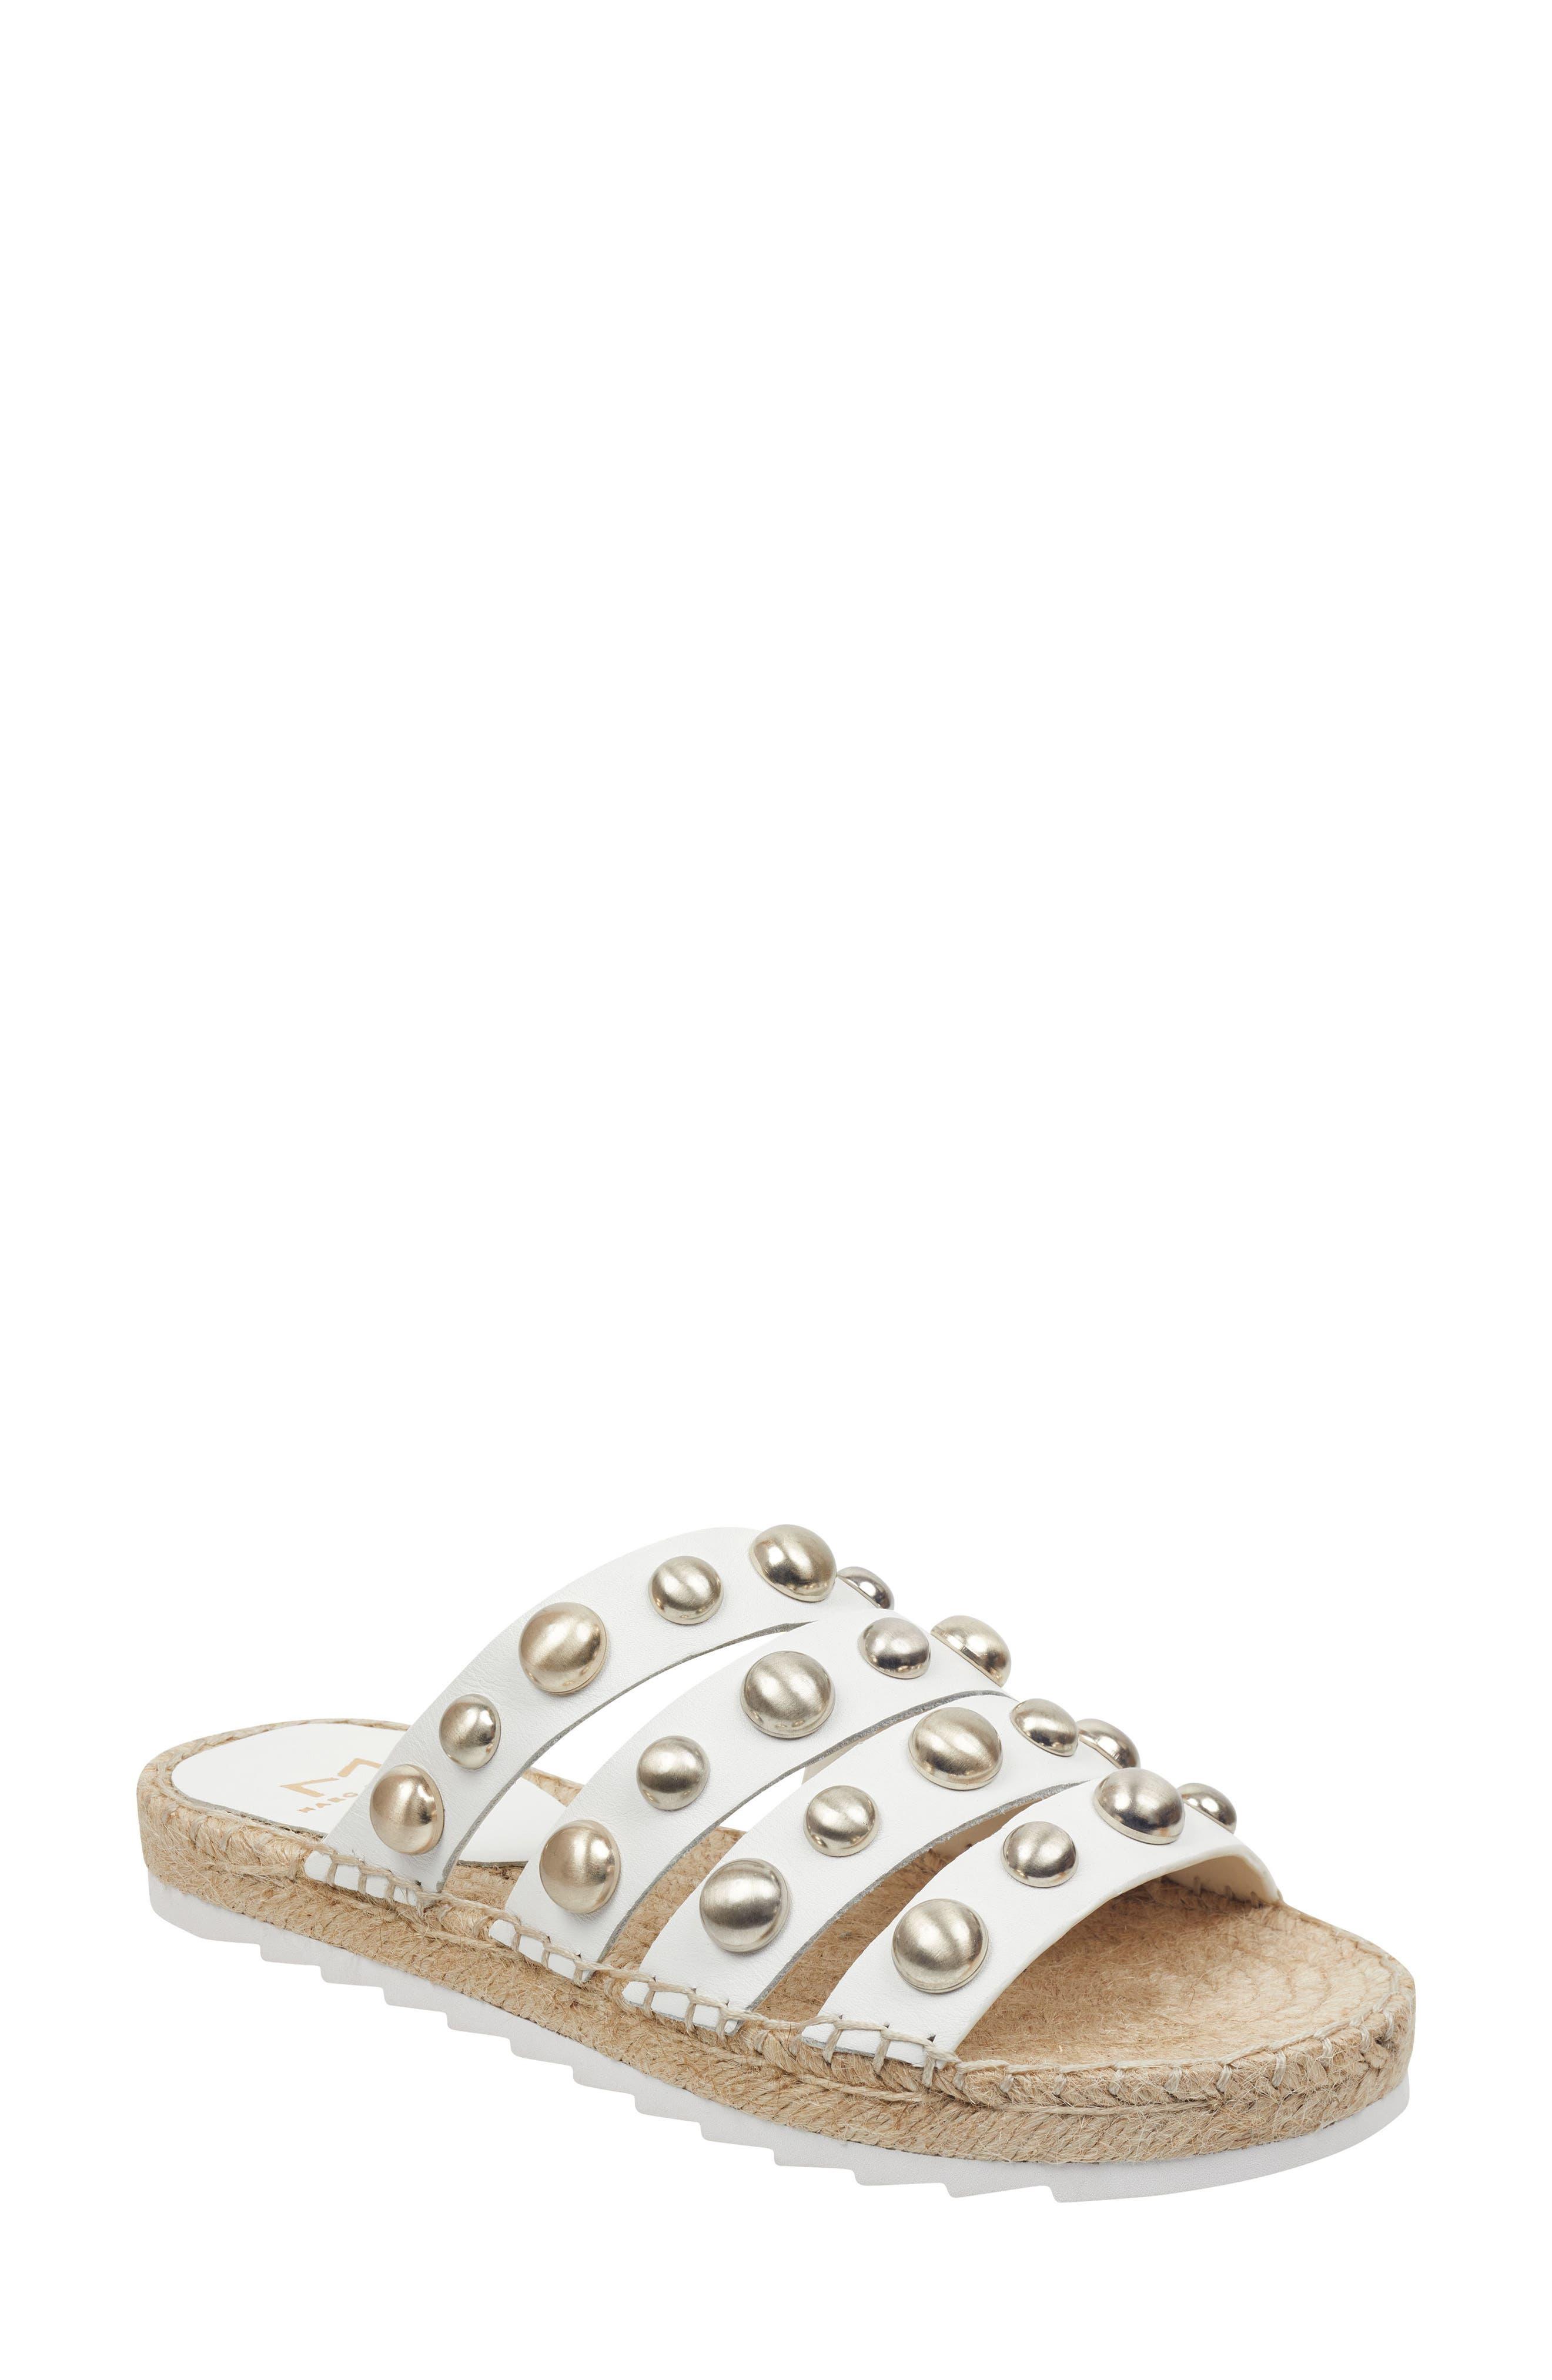 Marc Fisher Ltd Brandie Strappy Studded Slide Sandal, White